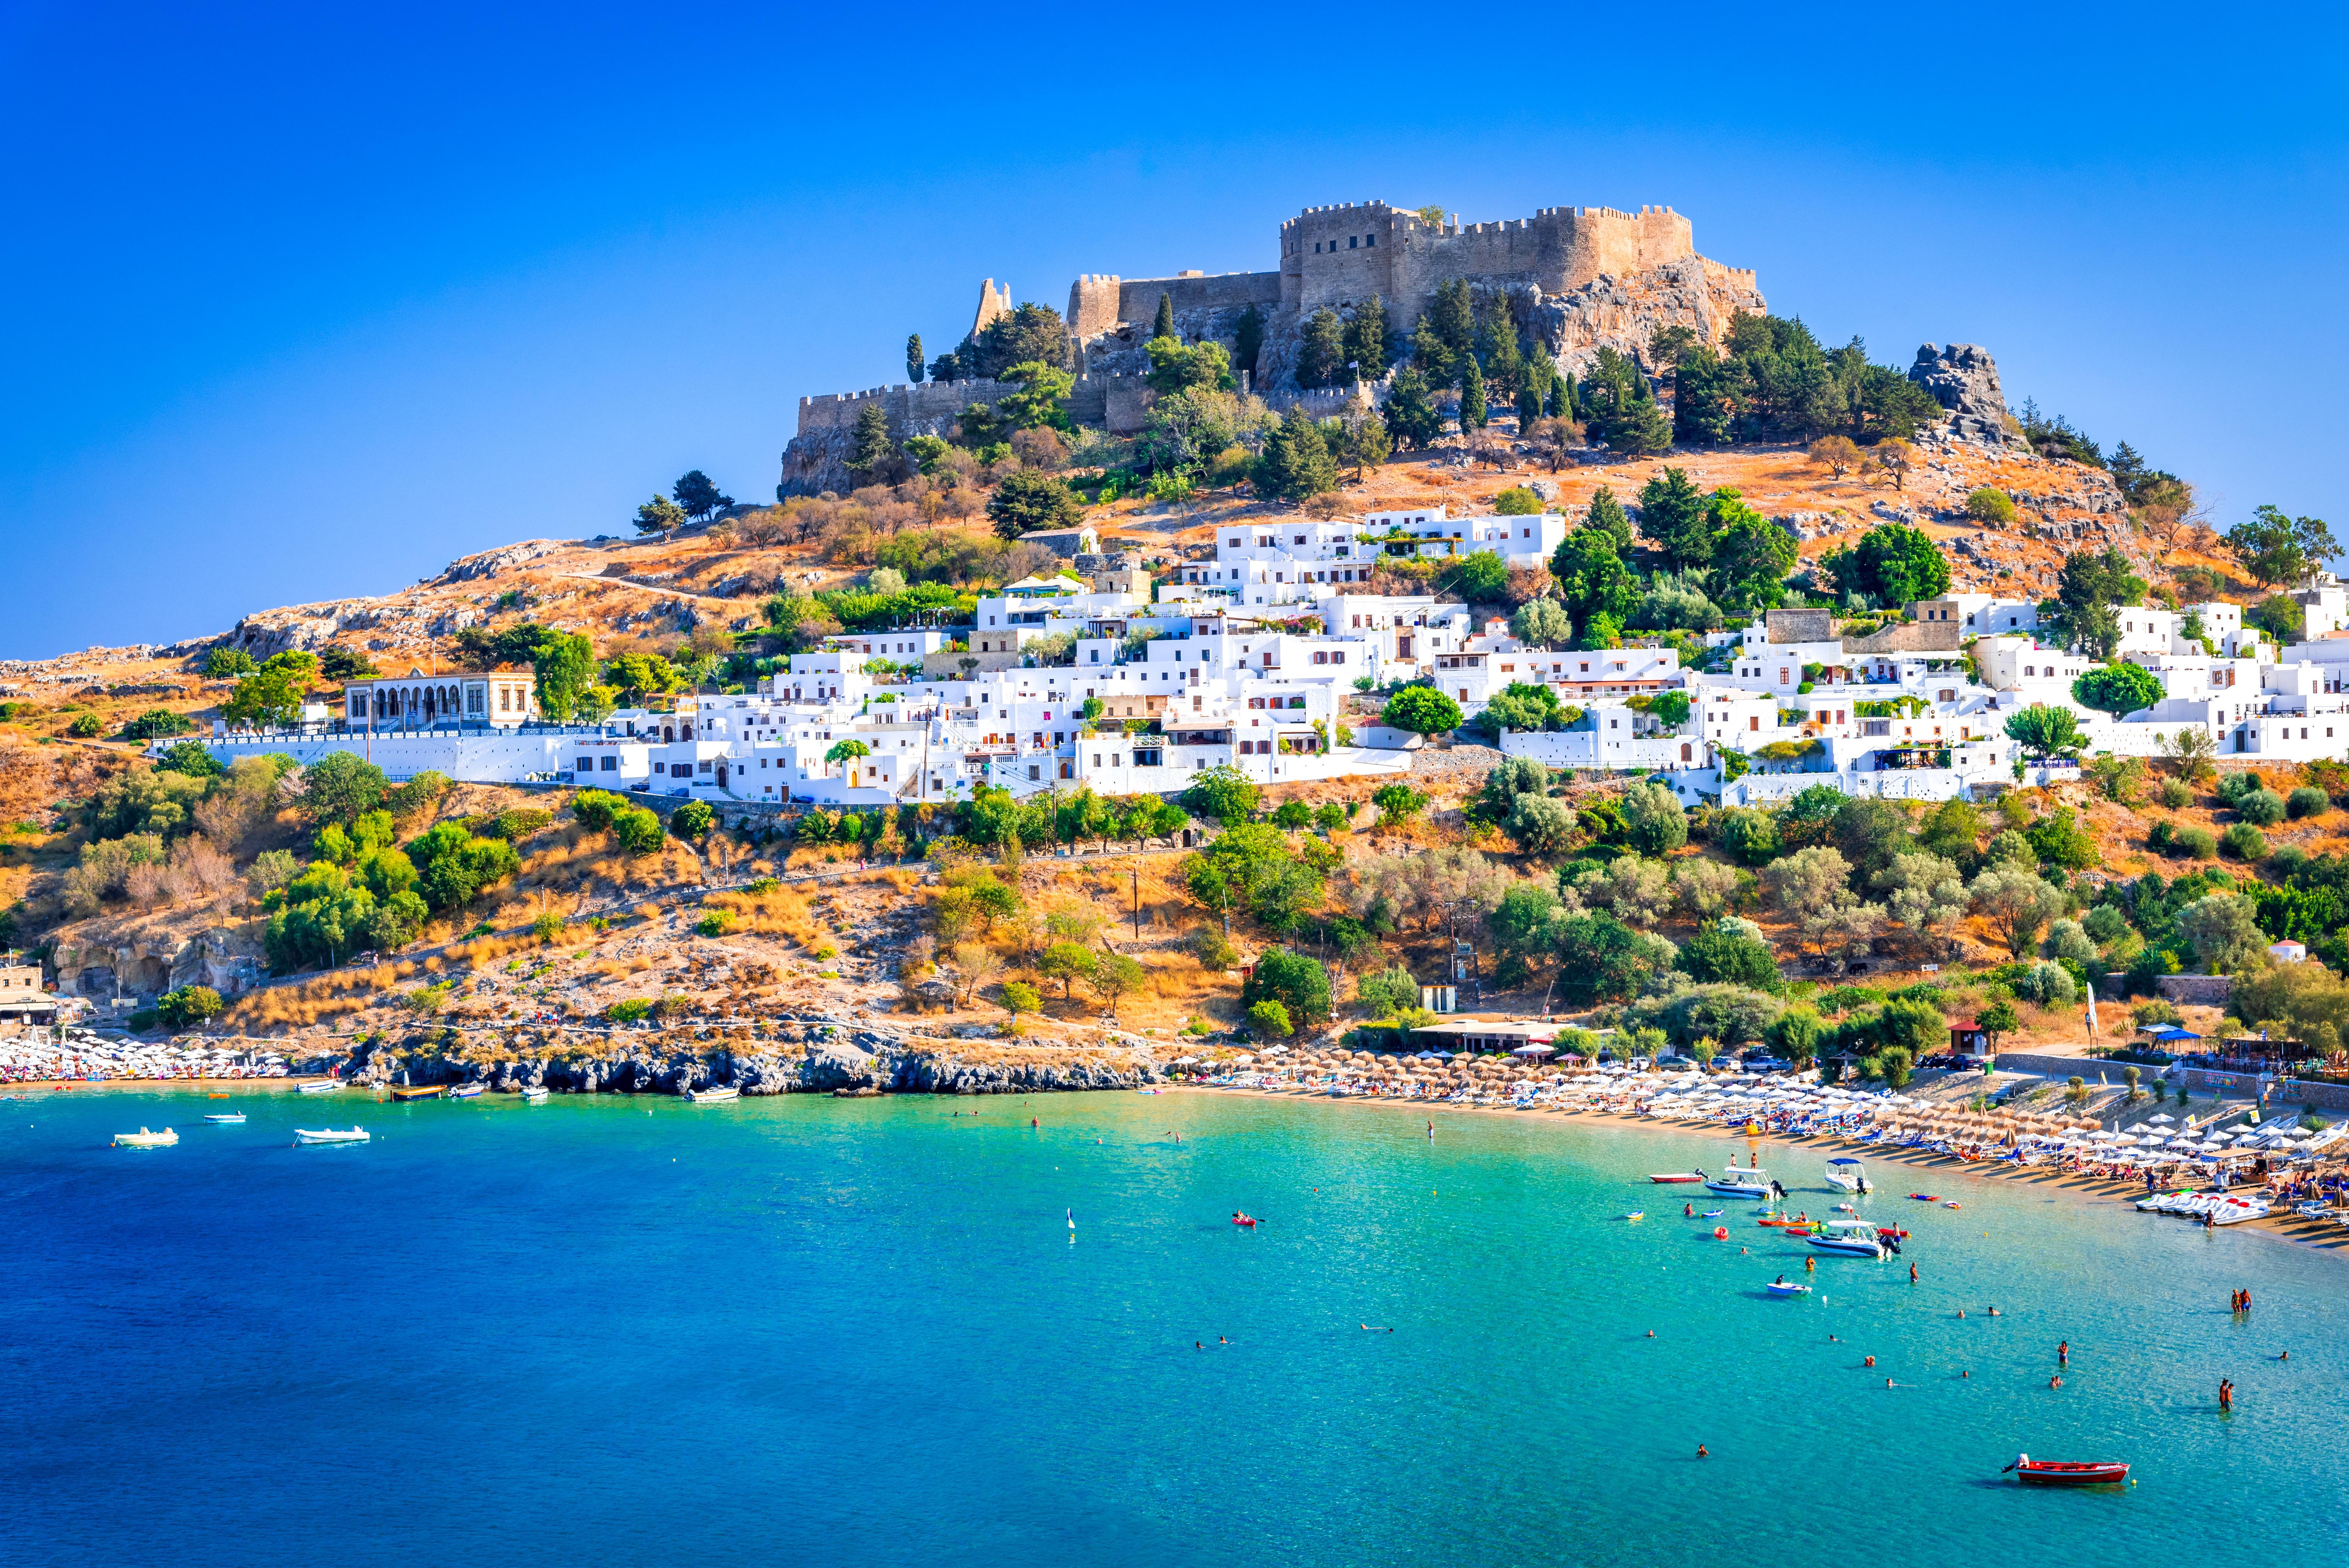 Urlaubsziel Griechenland Oktober